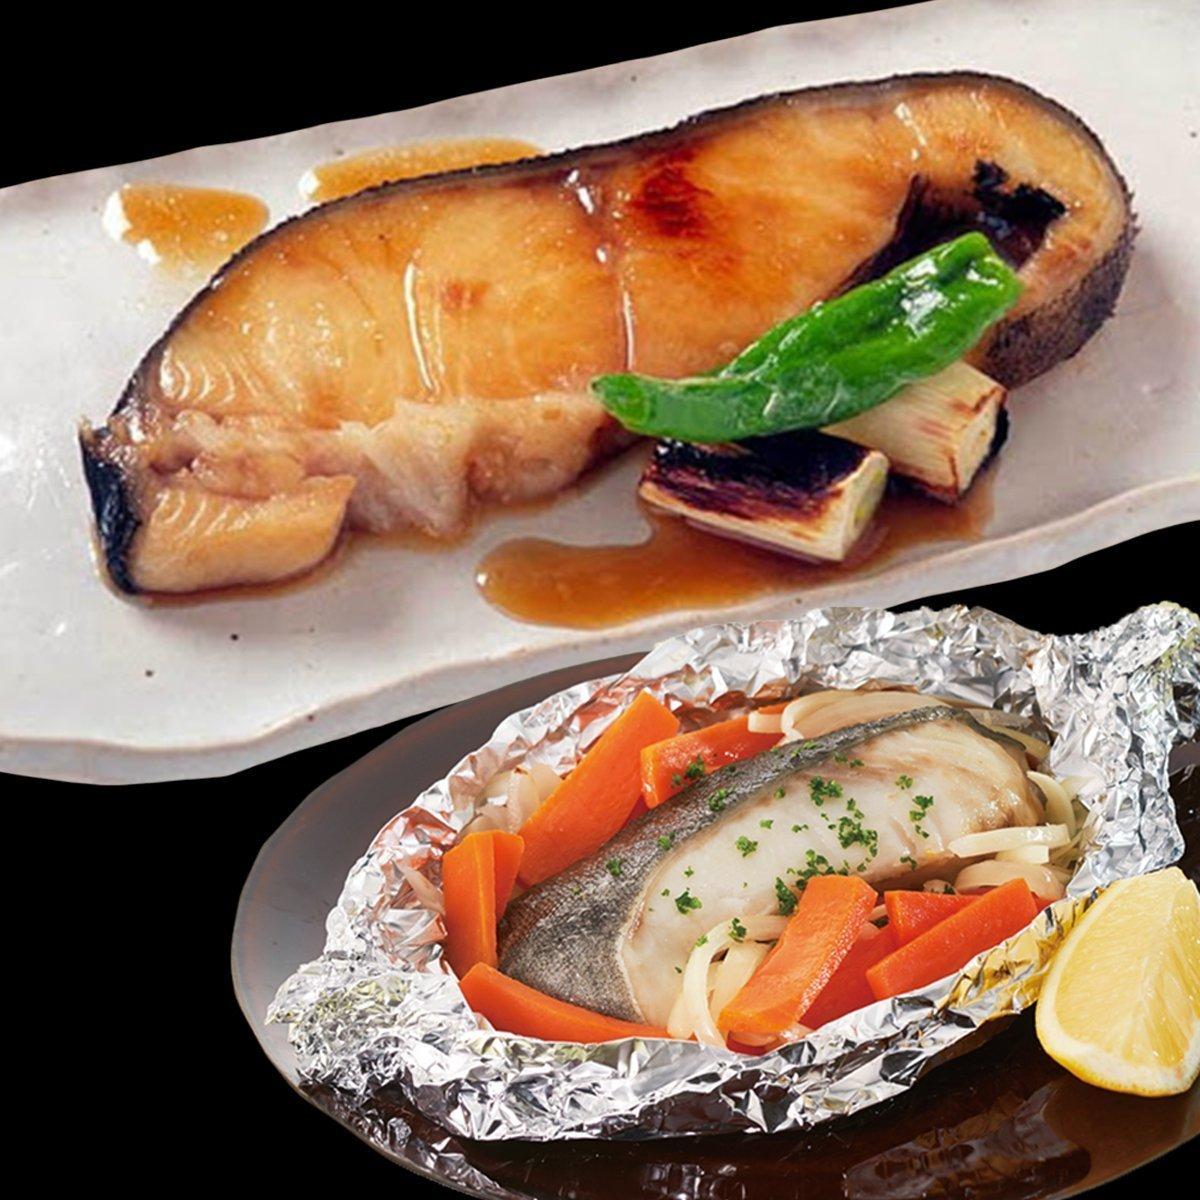 【In Bulk】Black Cod (Gindara) Cut 5pcs / 肉厚の銀鱈切身 切り身 120g x 5枚セット(業務用)